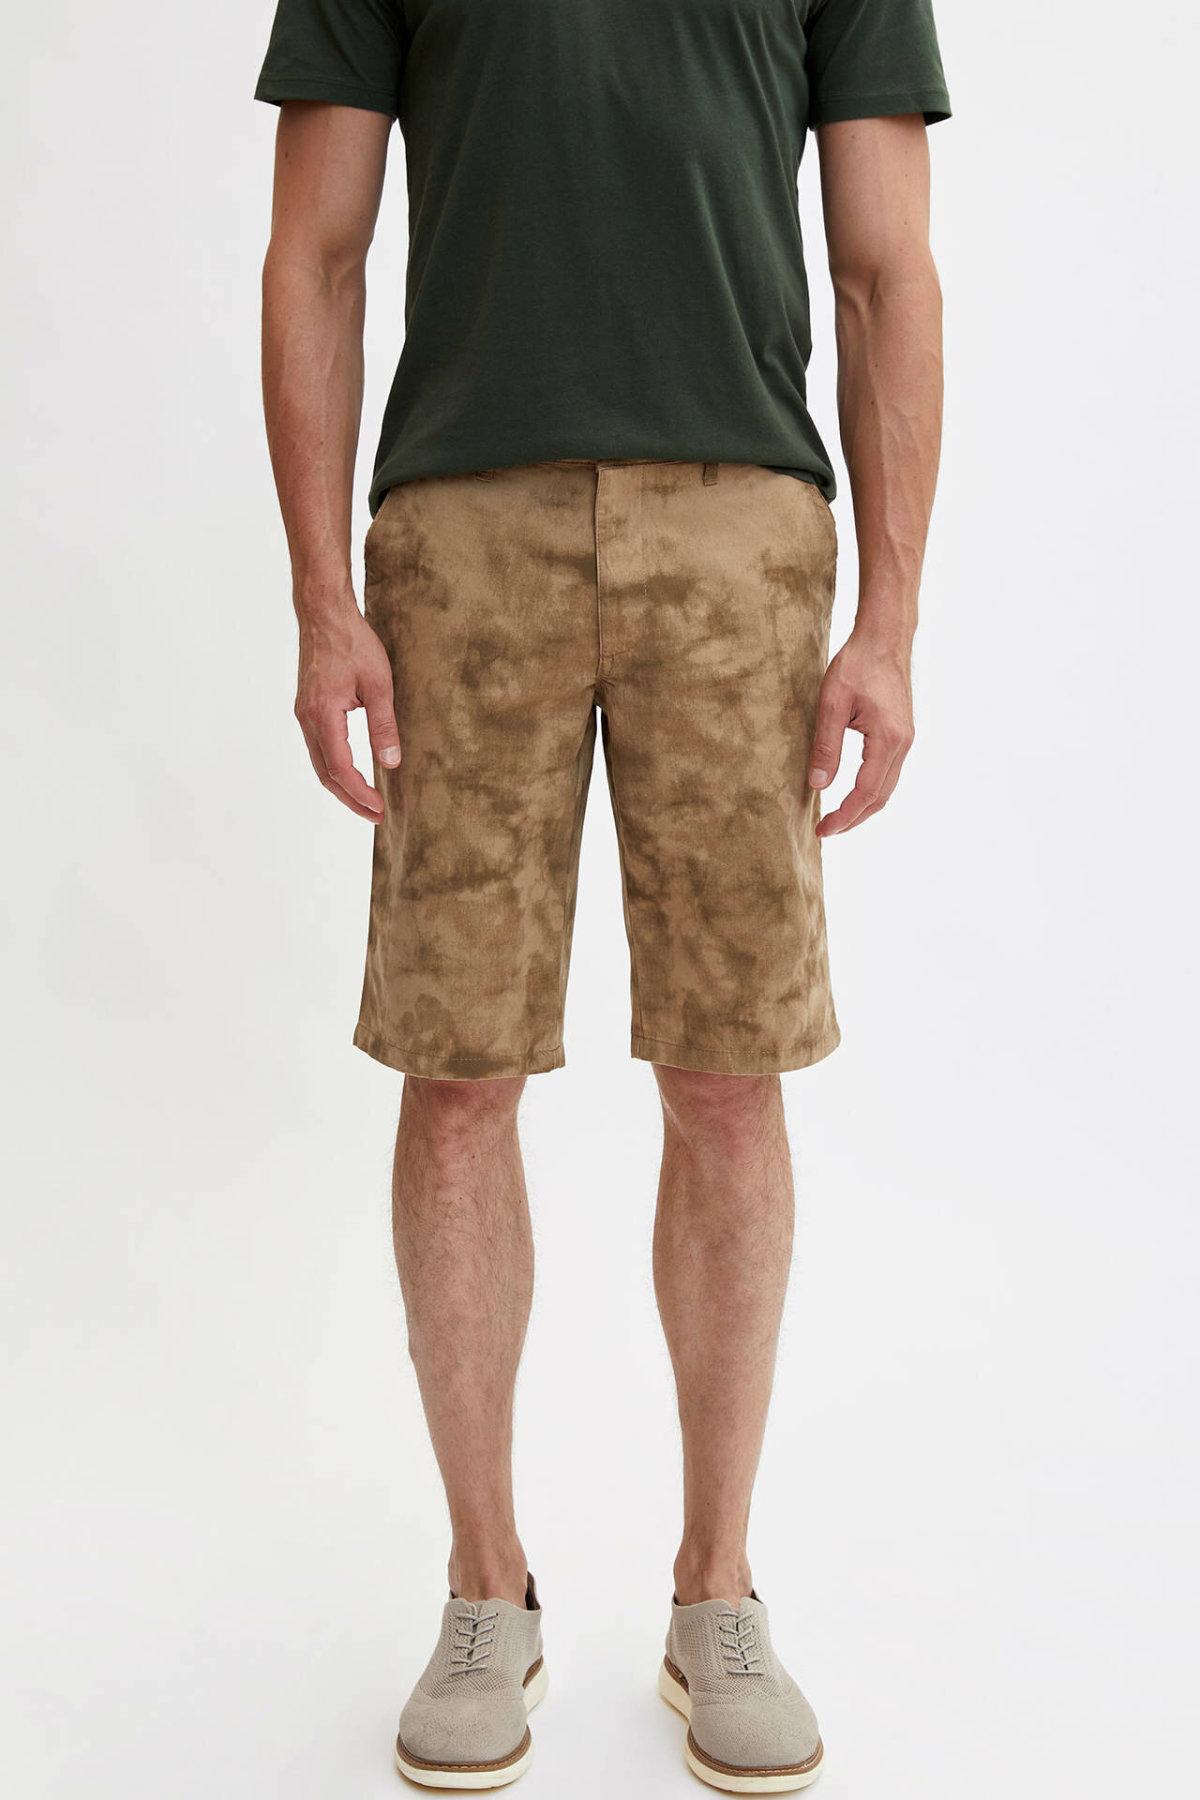 DeFacto Man Summer Beige Color Casual Shorts Men Mid-waist Short Bottoms Male Loose Bermuda Shorts-L6059AZ19SM